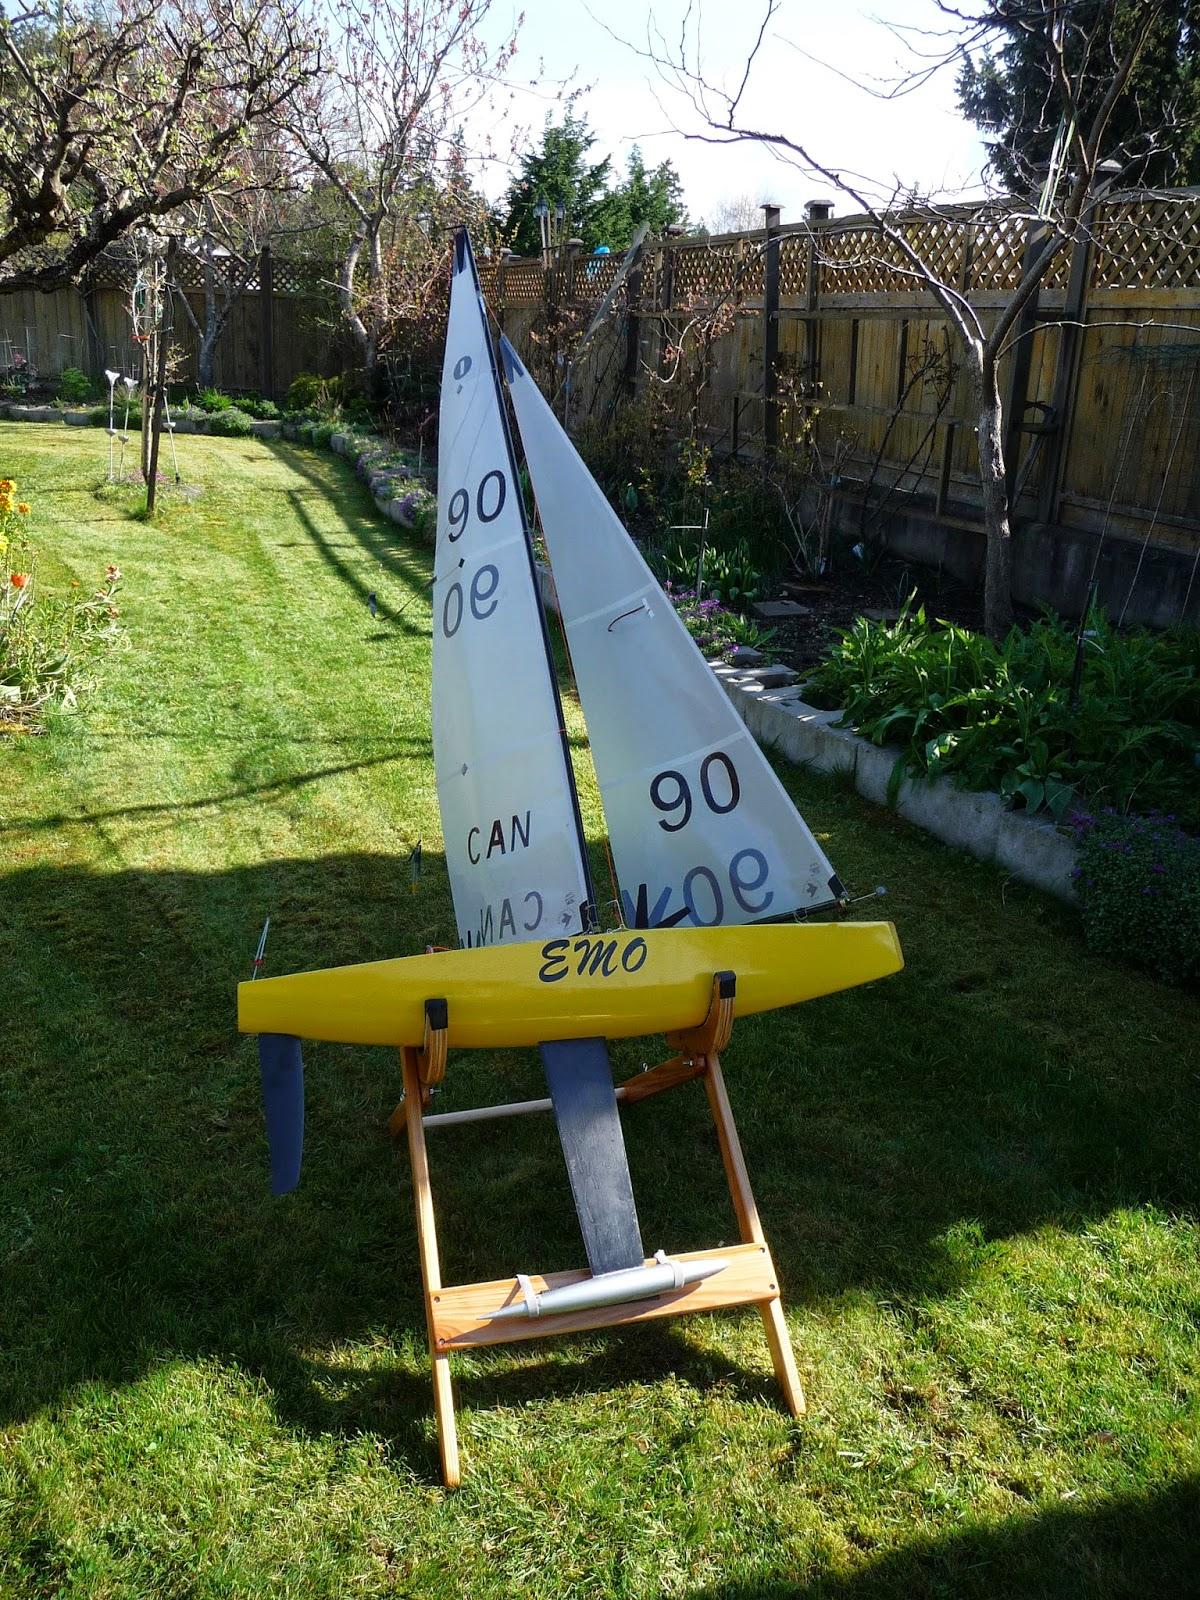 RC Sailing - Folding Wood Boat Stand - IOM | Tom'nDian Thornton's Spot